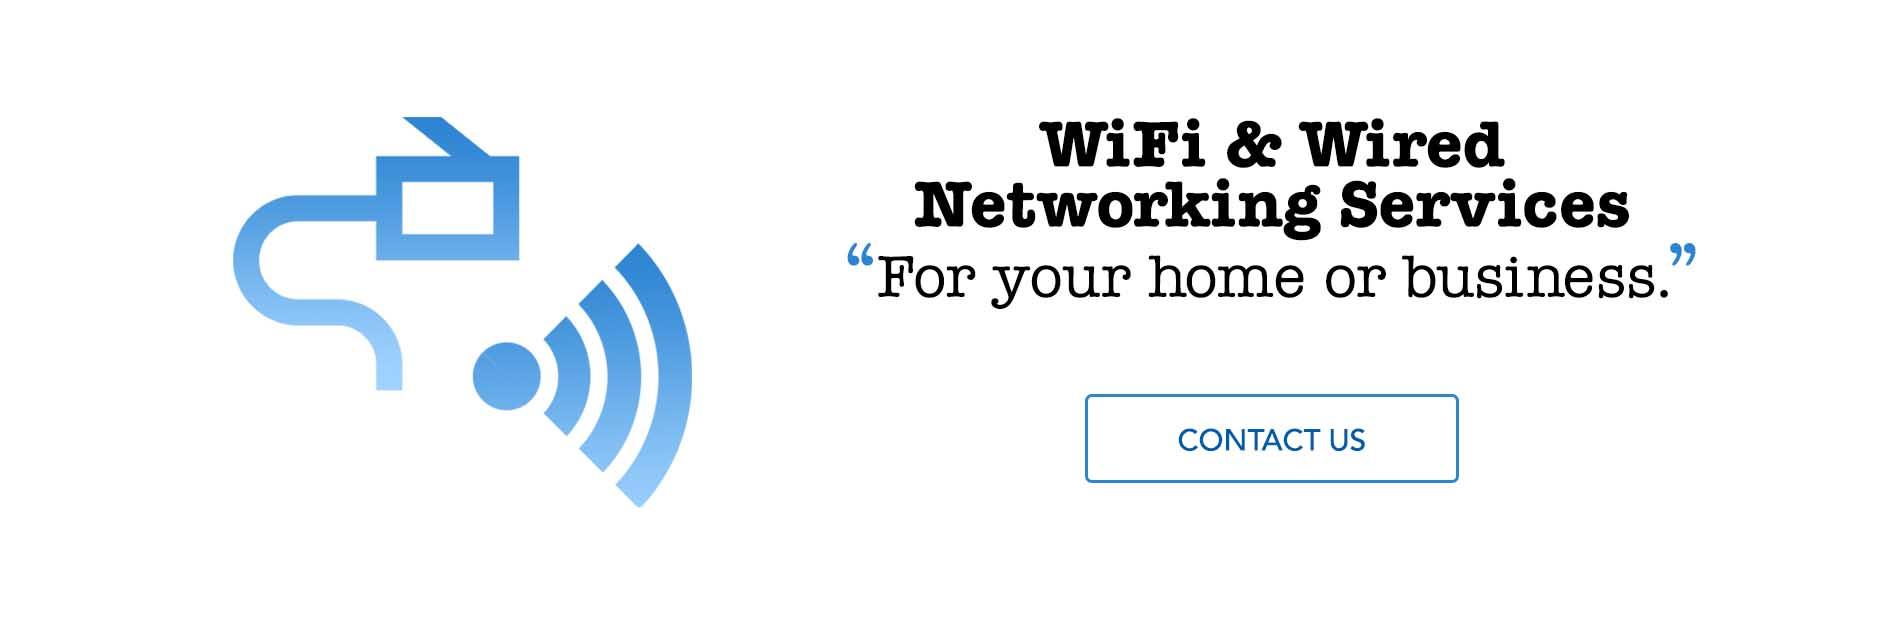 Networking 2645.jpg